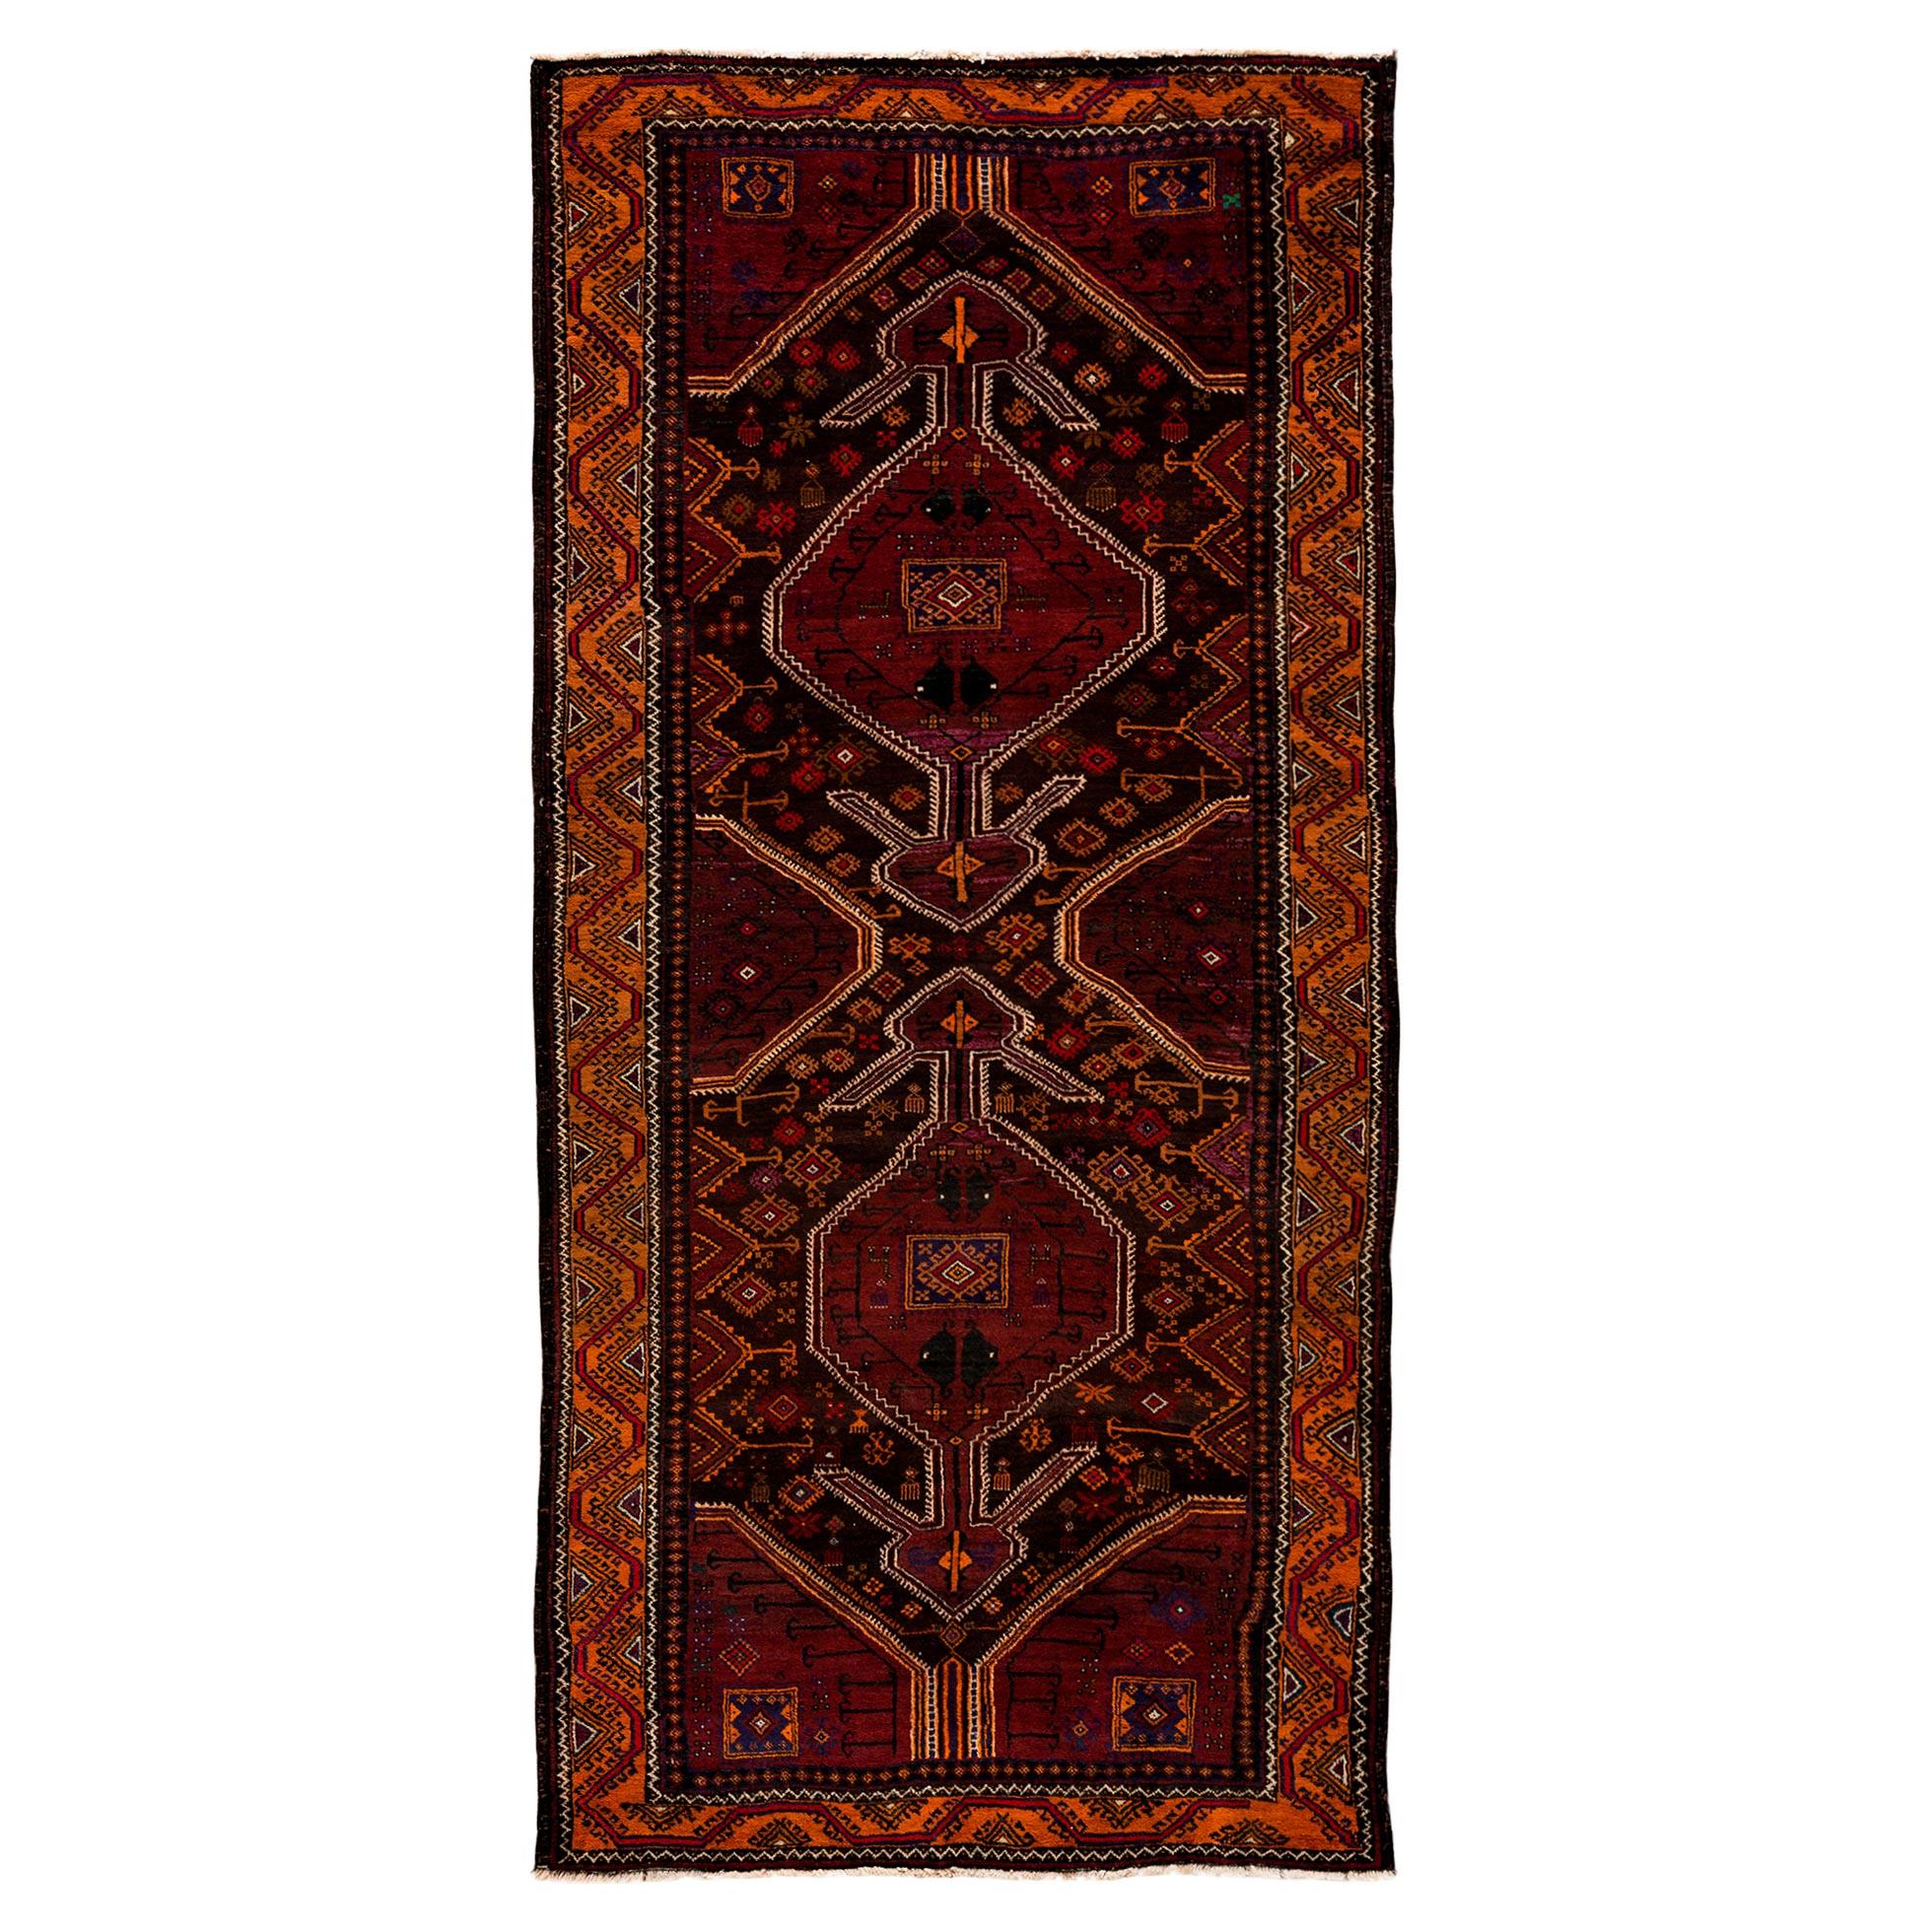 Yula Global Bazaar Burgundy Persian Wool Rug - 4'3 x 9'3